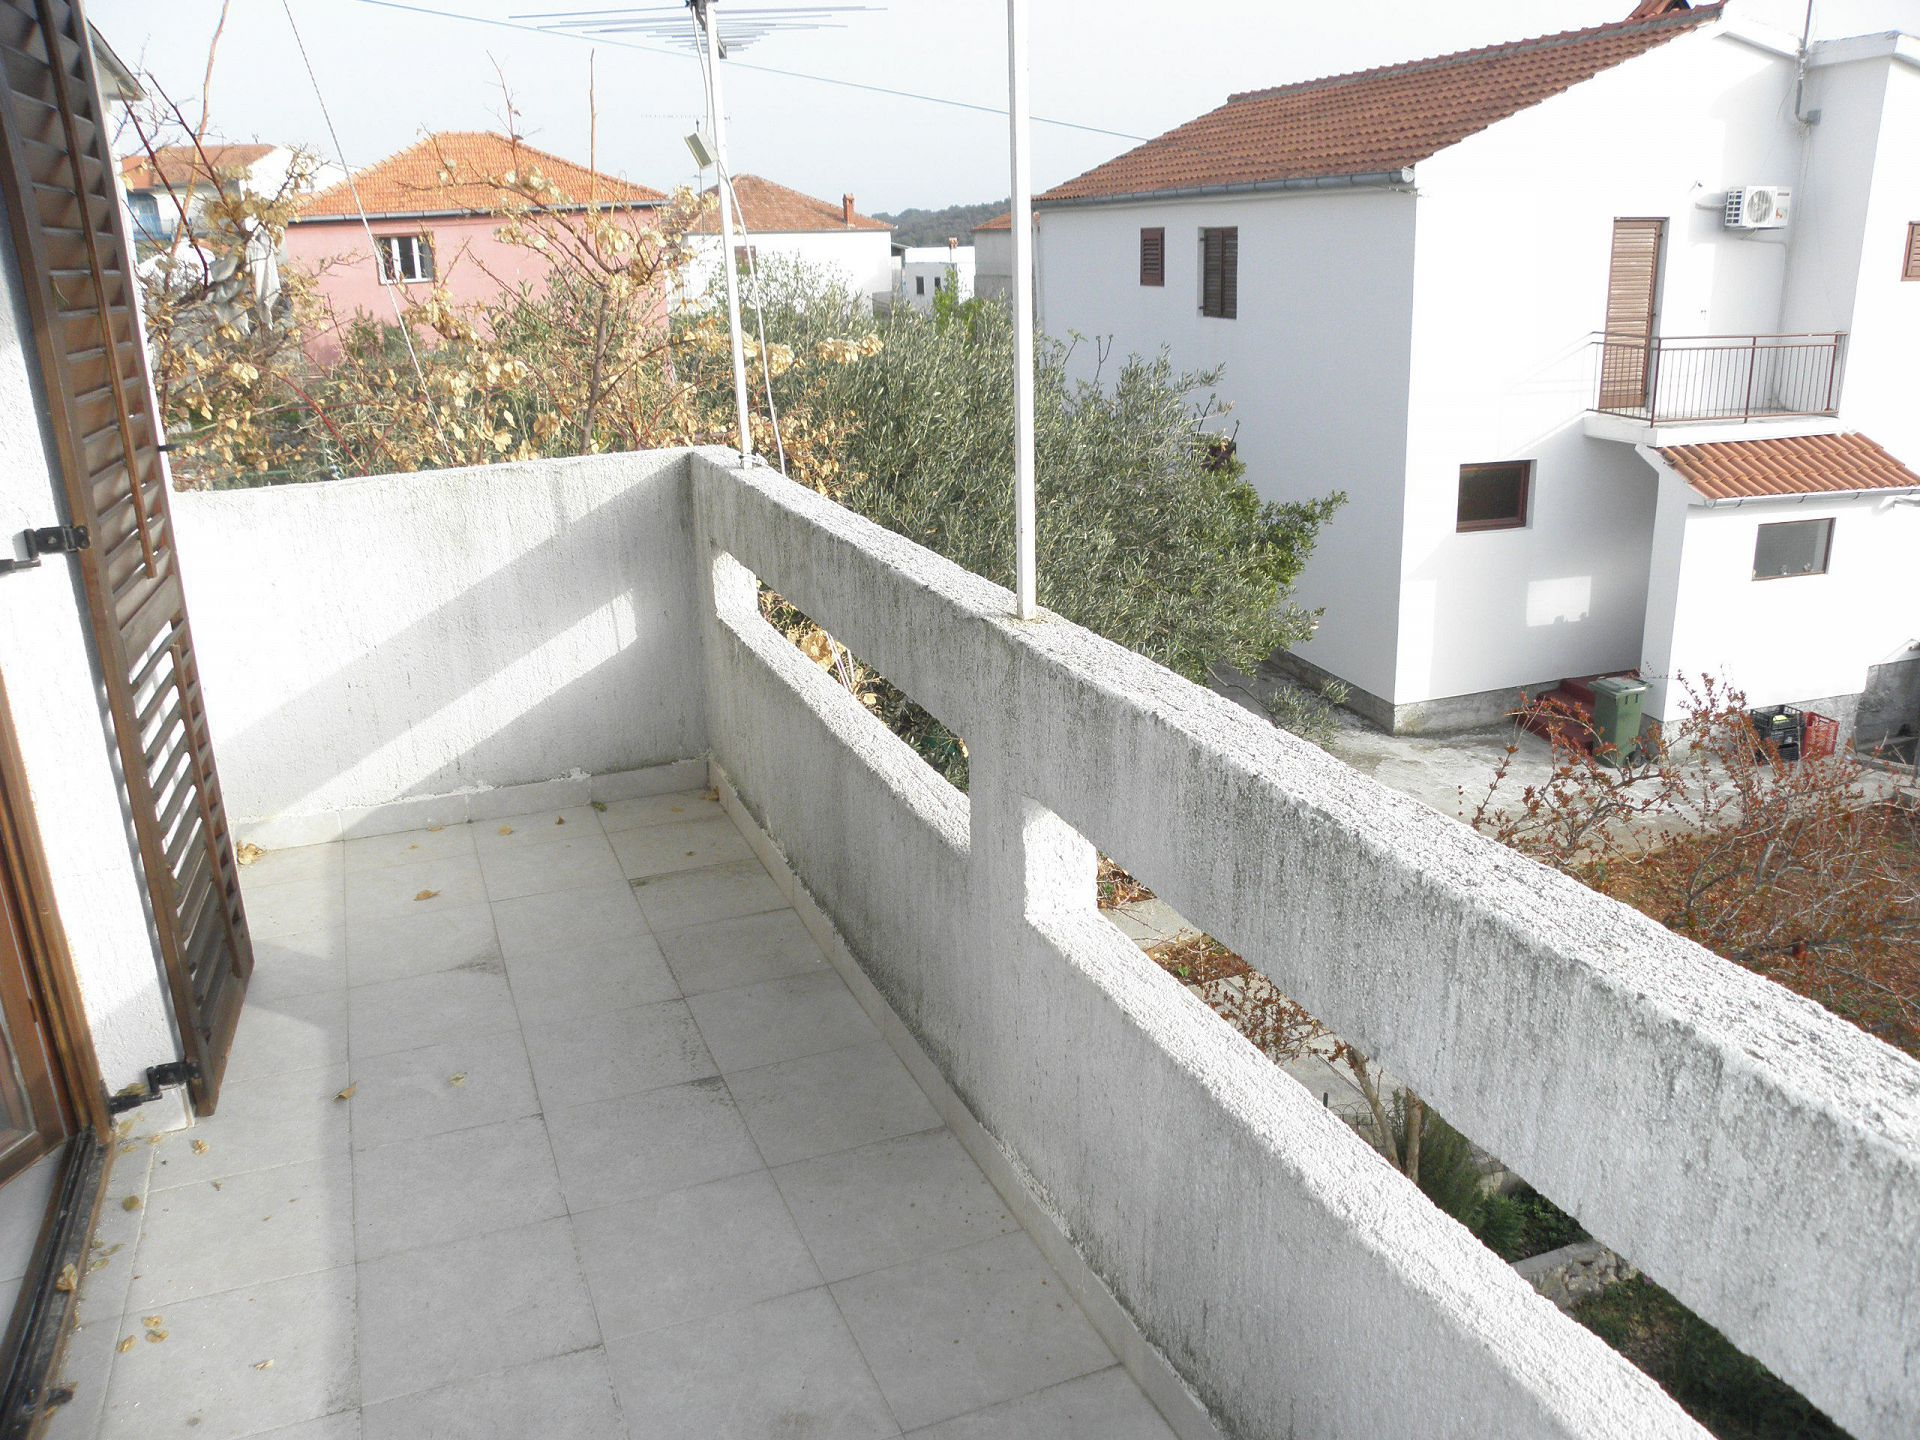 5407 - Jezera - Apartments Croatia - A1(2+1): terrace